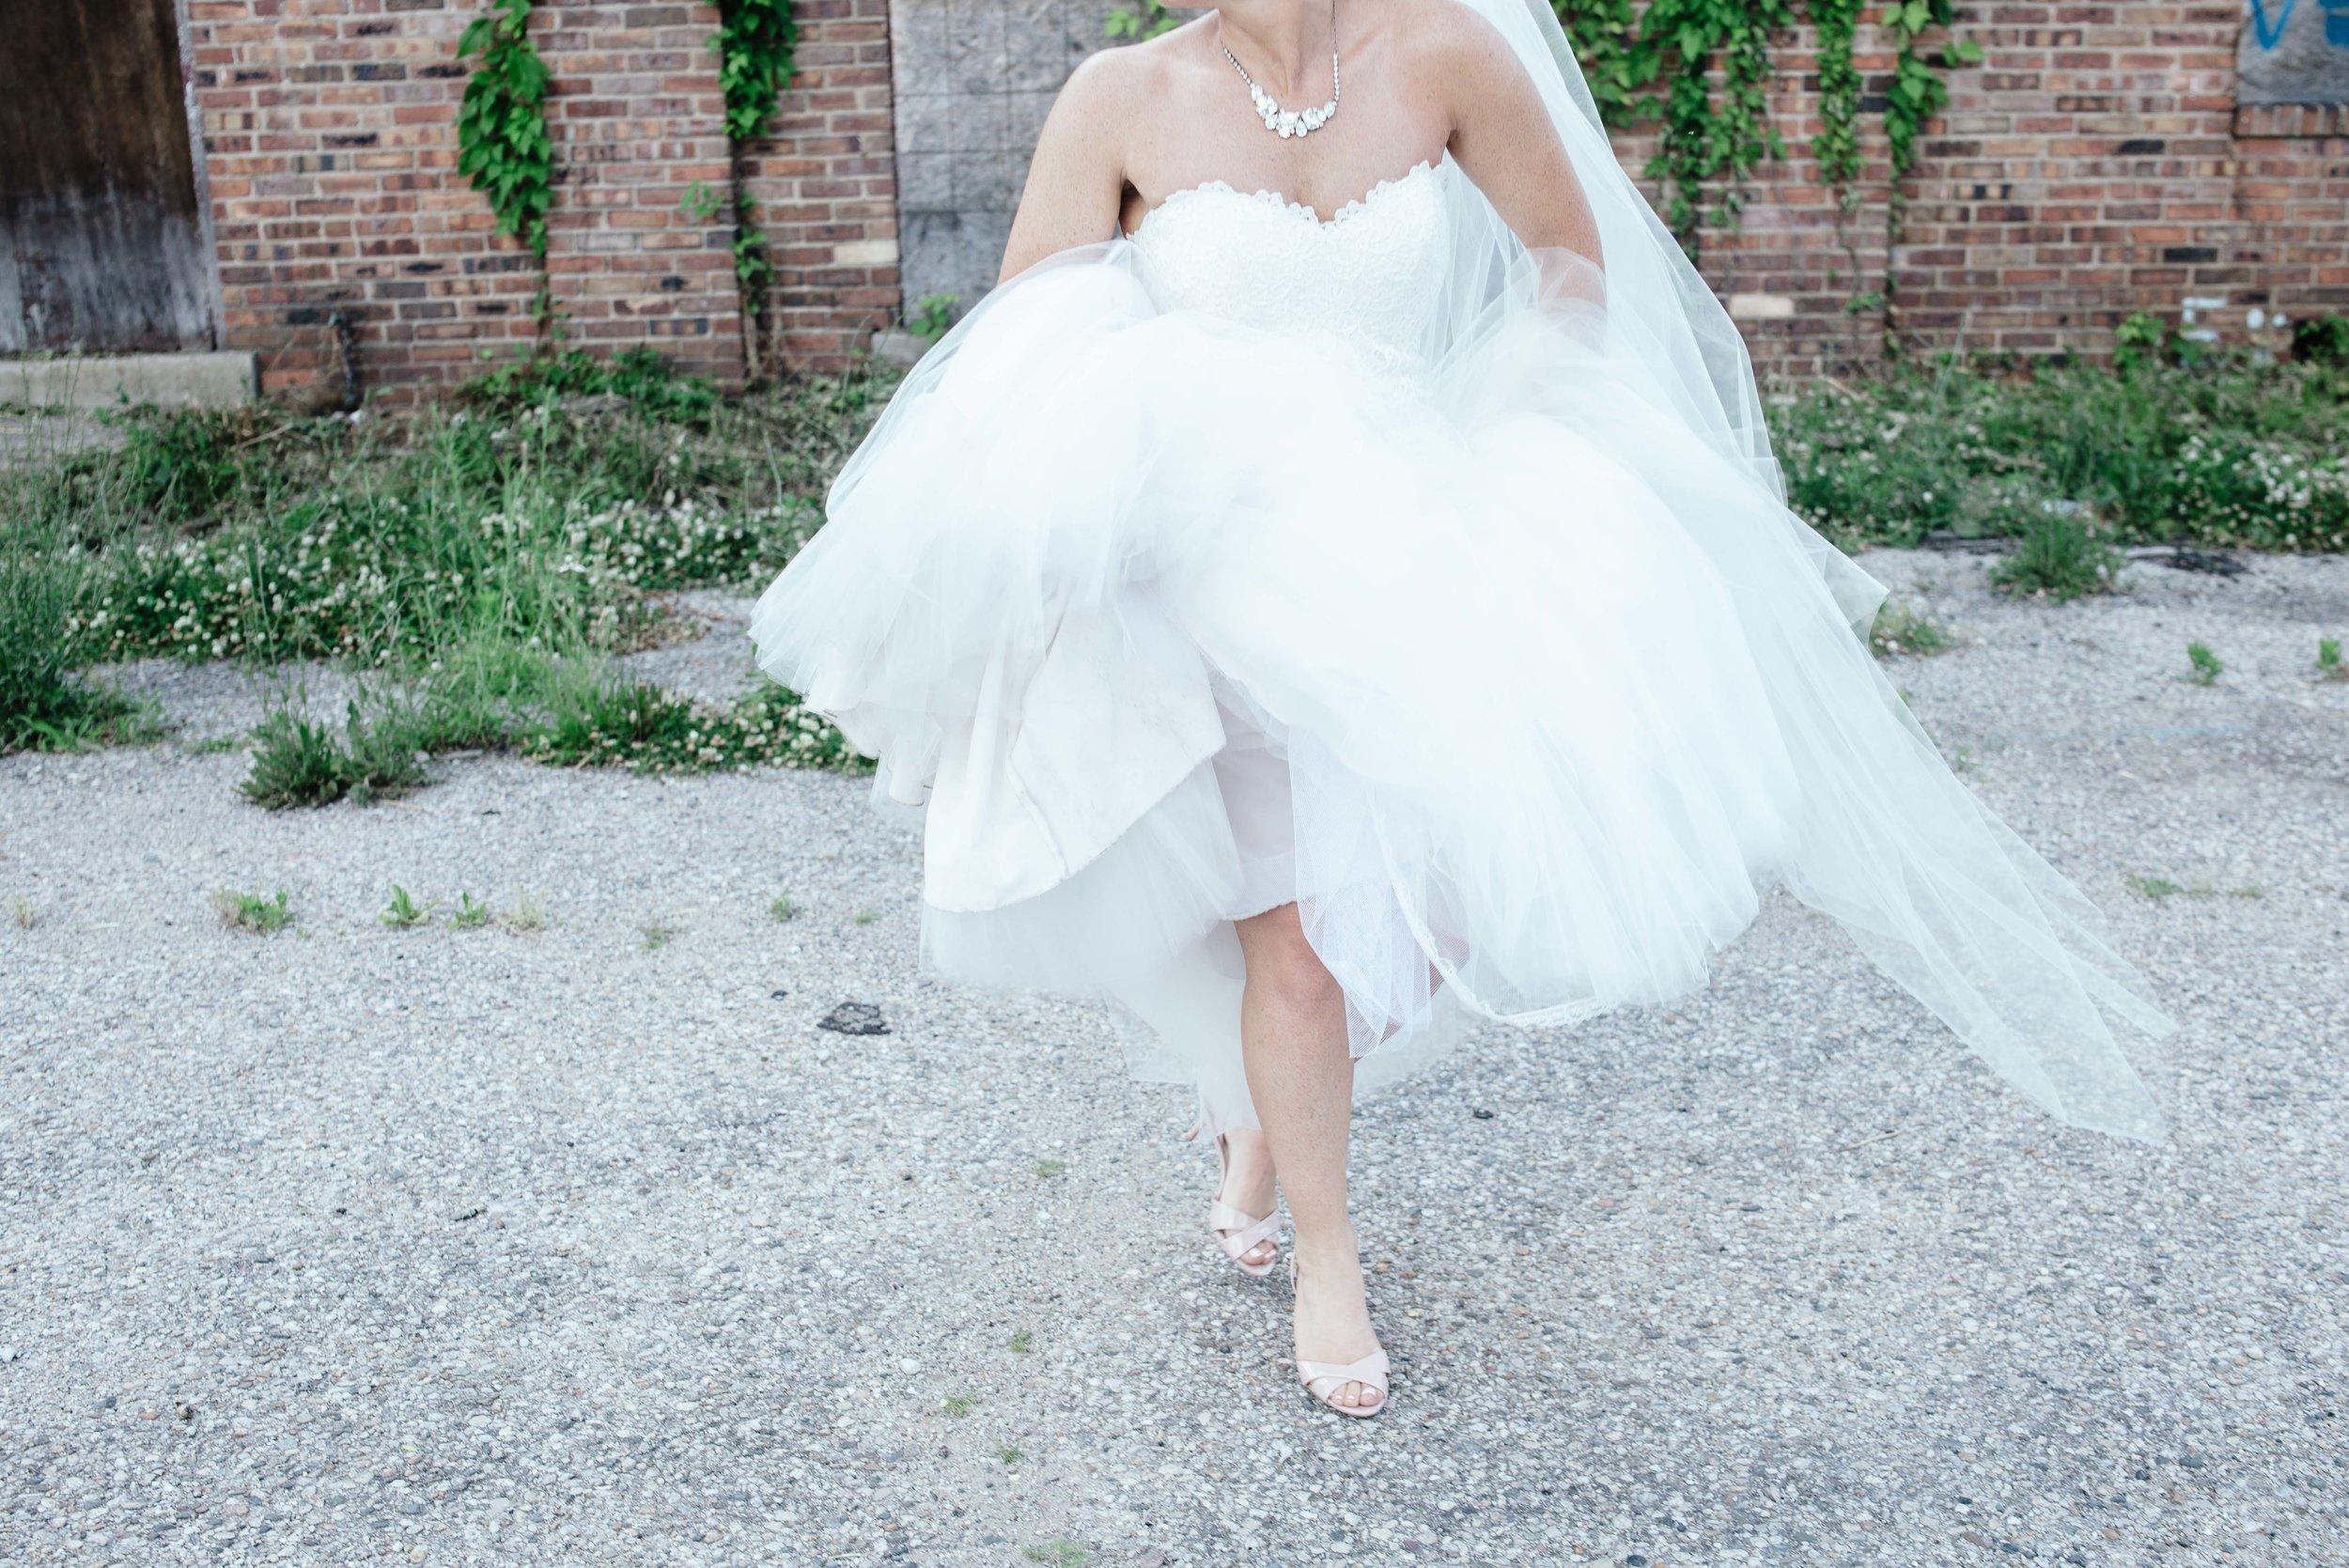 Mina-Steve-Blog-Indianapolis-Wedding-98.jpg